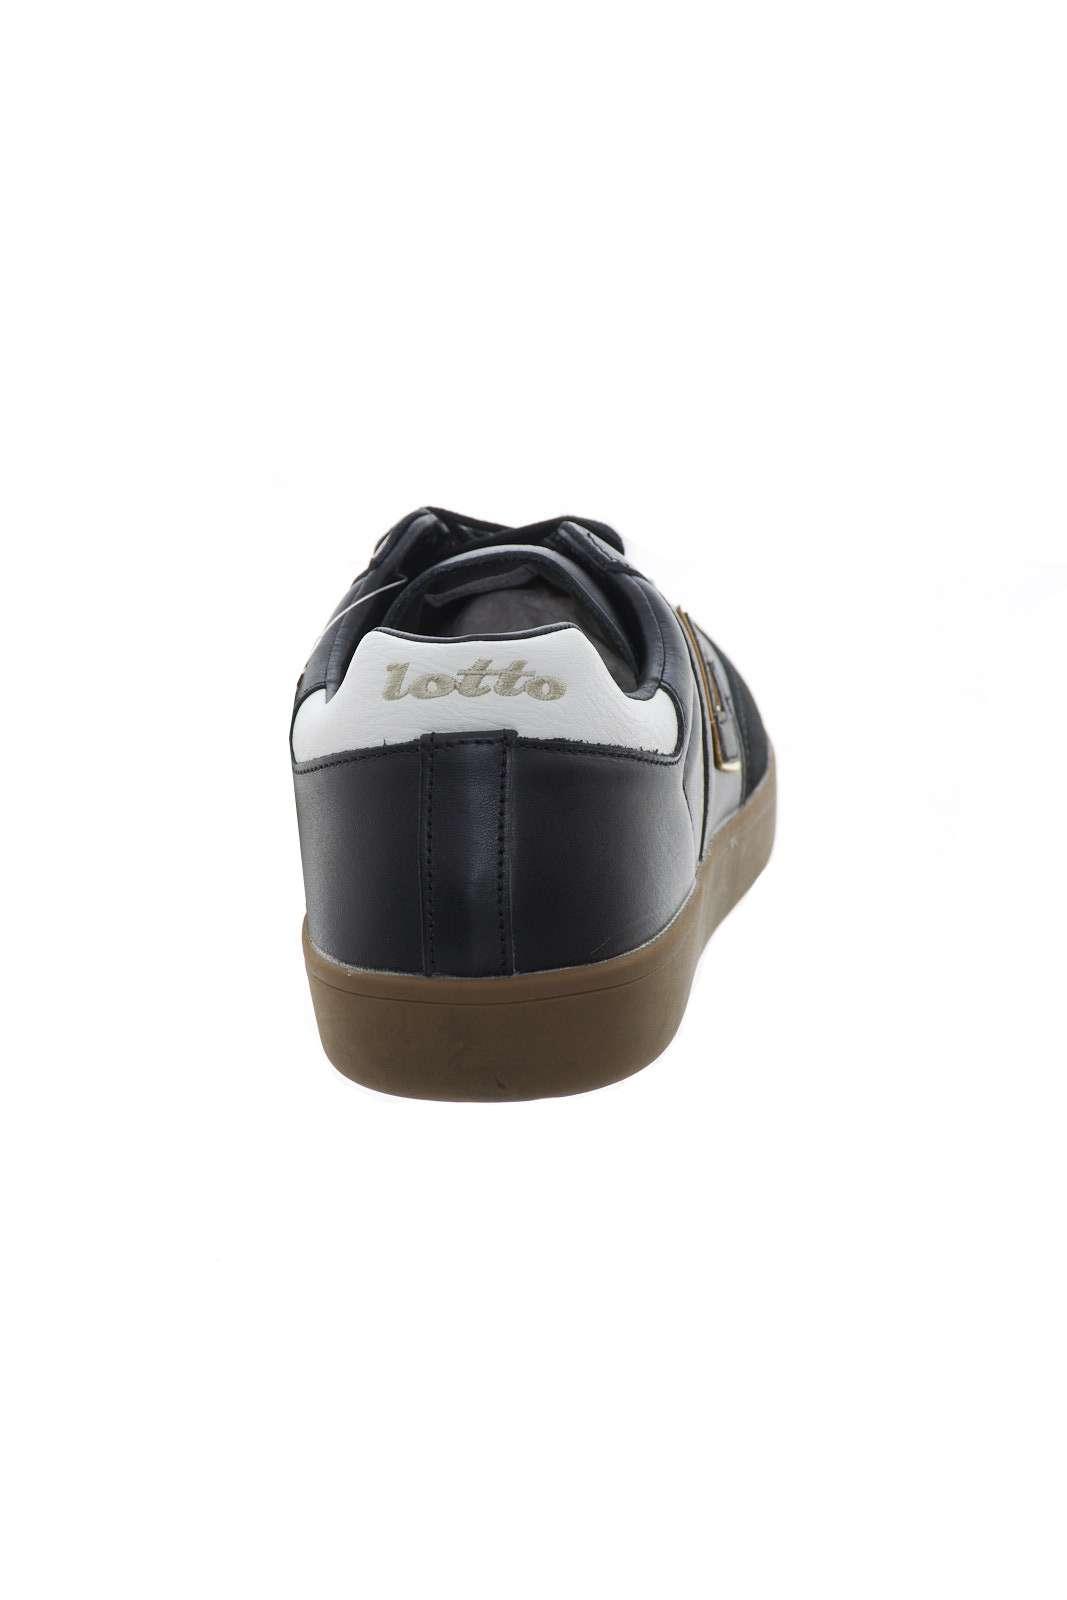 https://www.parmax.com/media/catalog/product/a/i/ai-outlet_parmax-sneaker-lotto-t7364-d_2.jpg